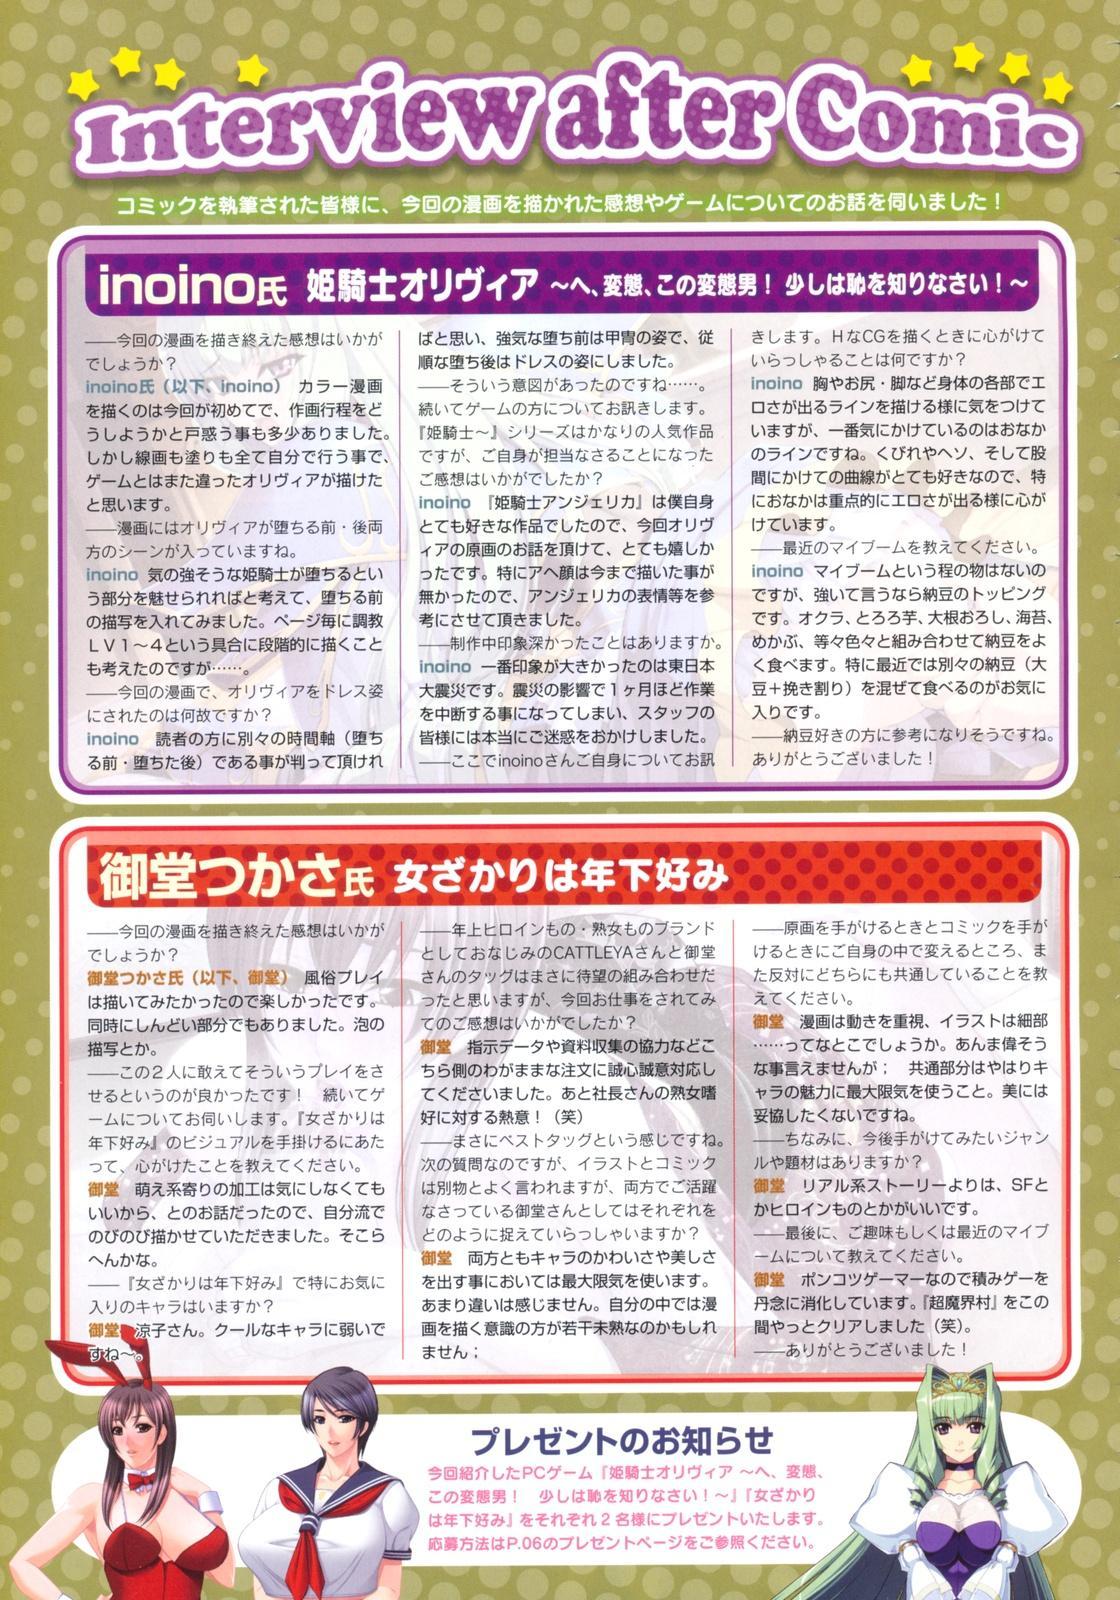 COMIC Megastore 2012-01 20